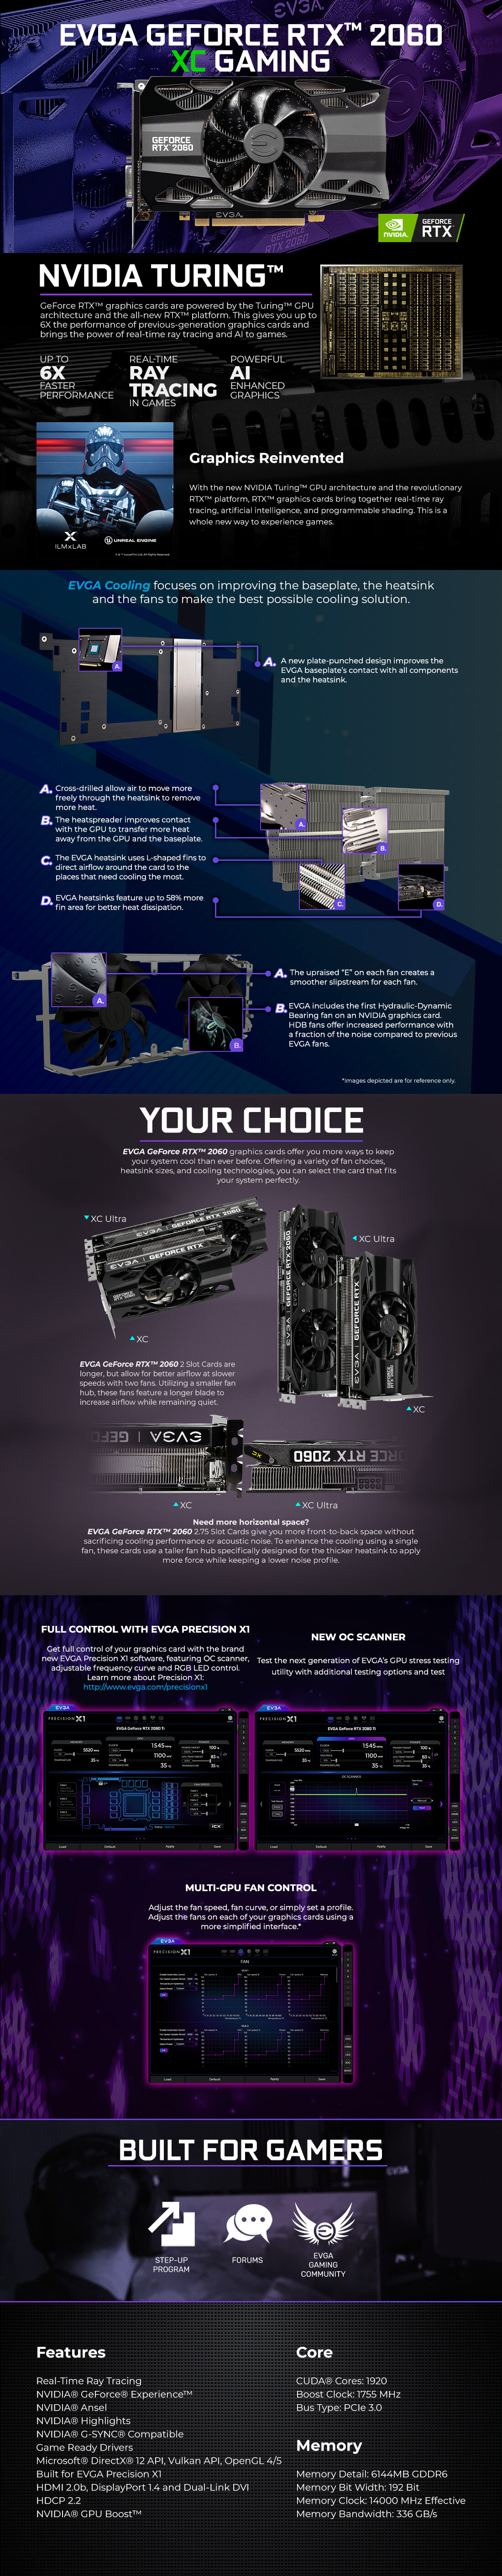 EVGA GeForce RTX 2060 XC Gaming 6G Graphics Card